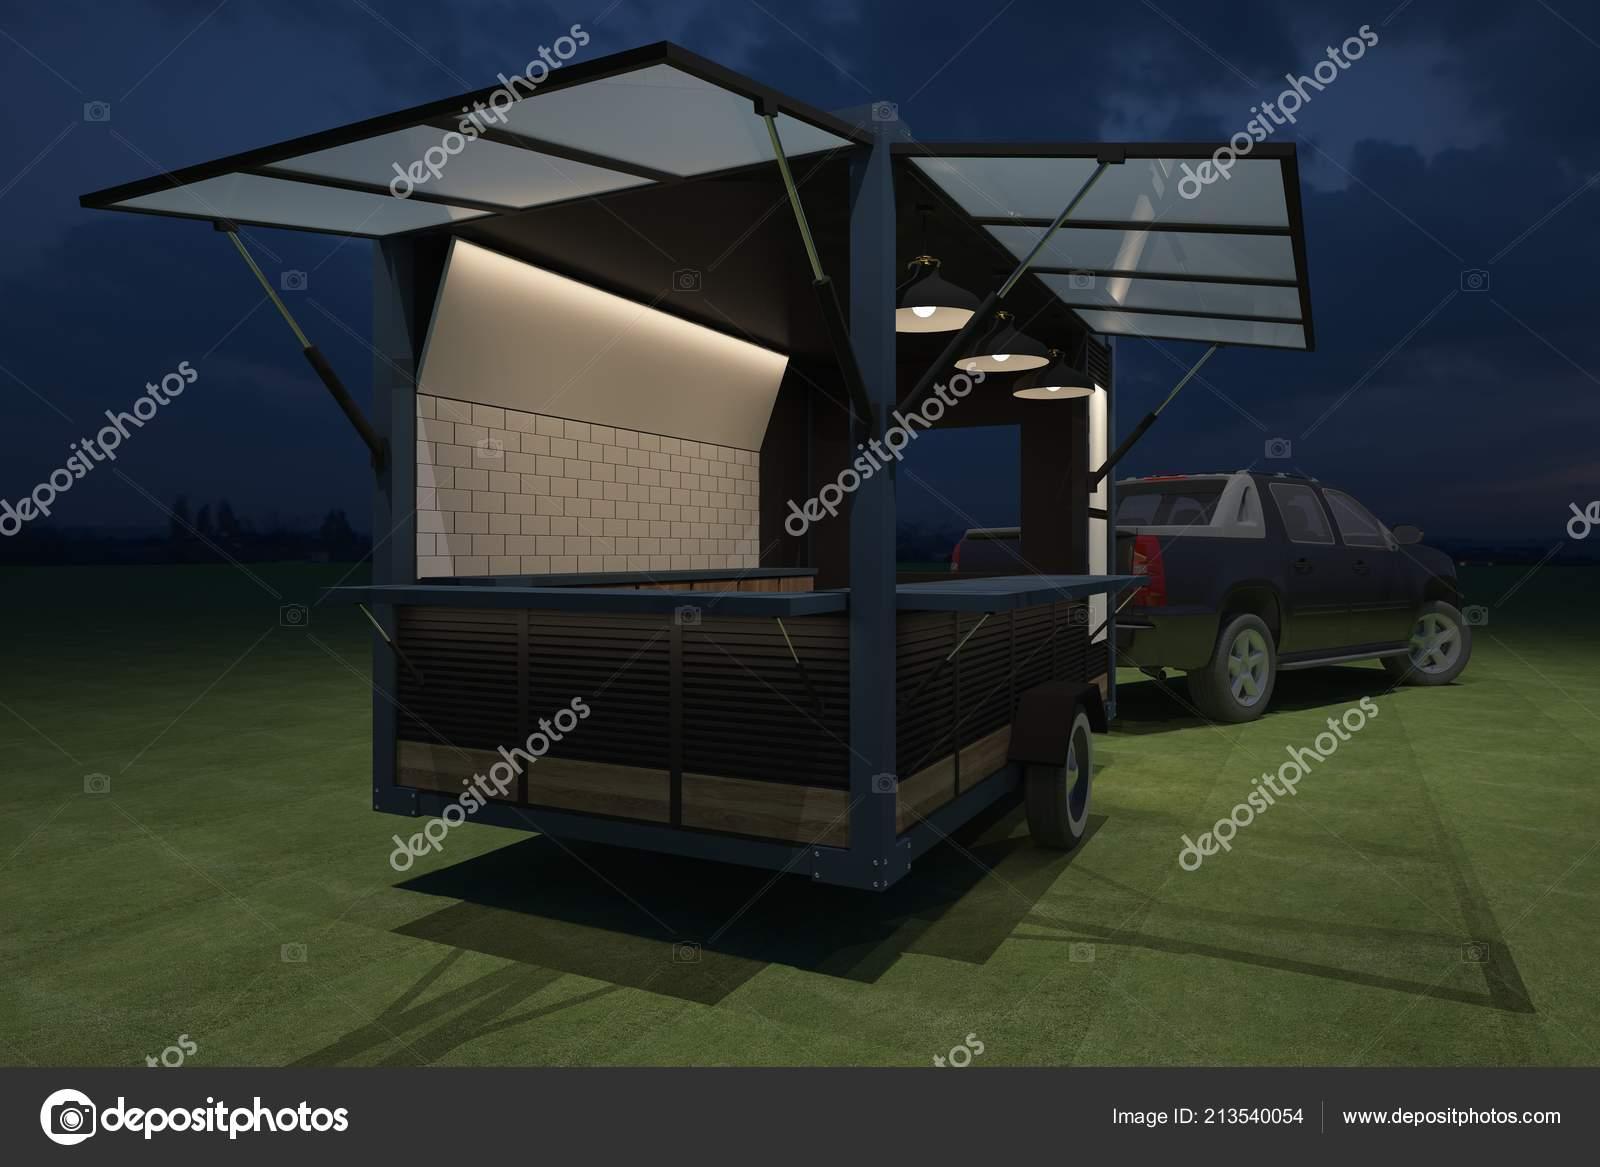 Food Truck Kiosk Cafe Design Rendering Illustration — Stock